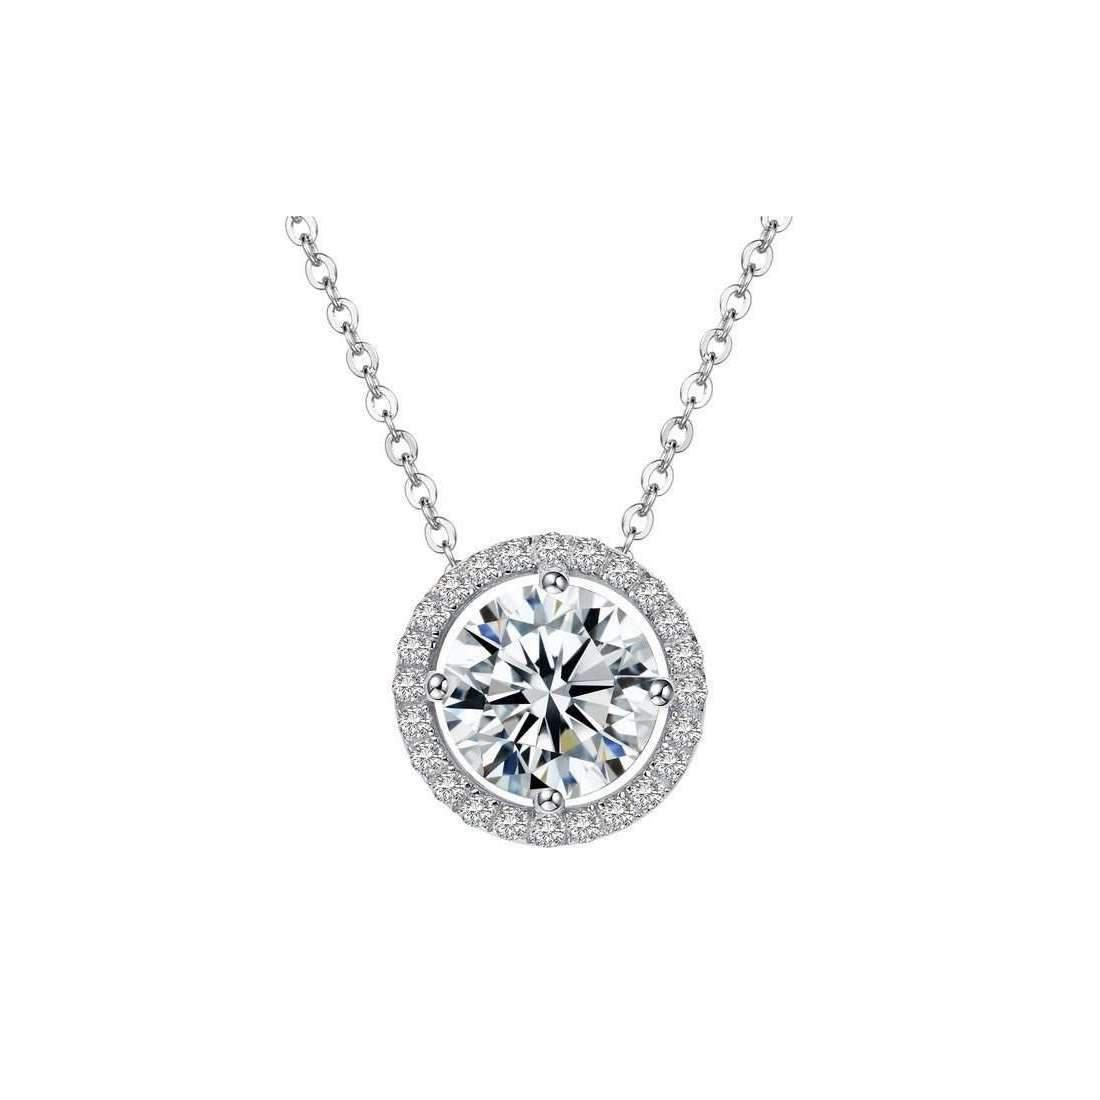 Sian Bostwick Jewellery Wonderland Royal Crest Heart Necklace - 16 Fa8i4T